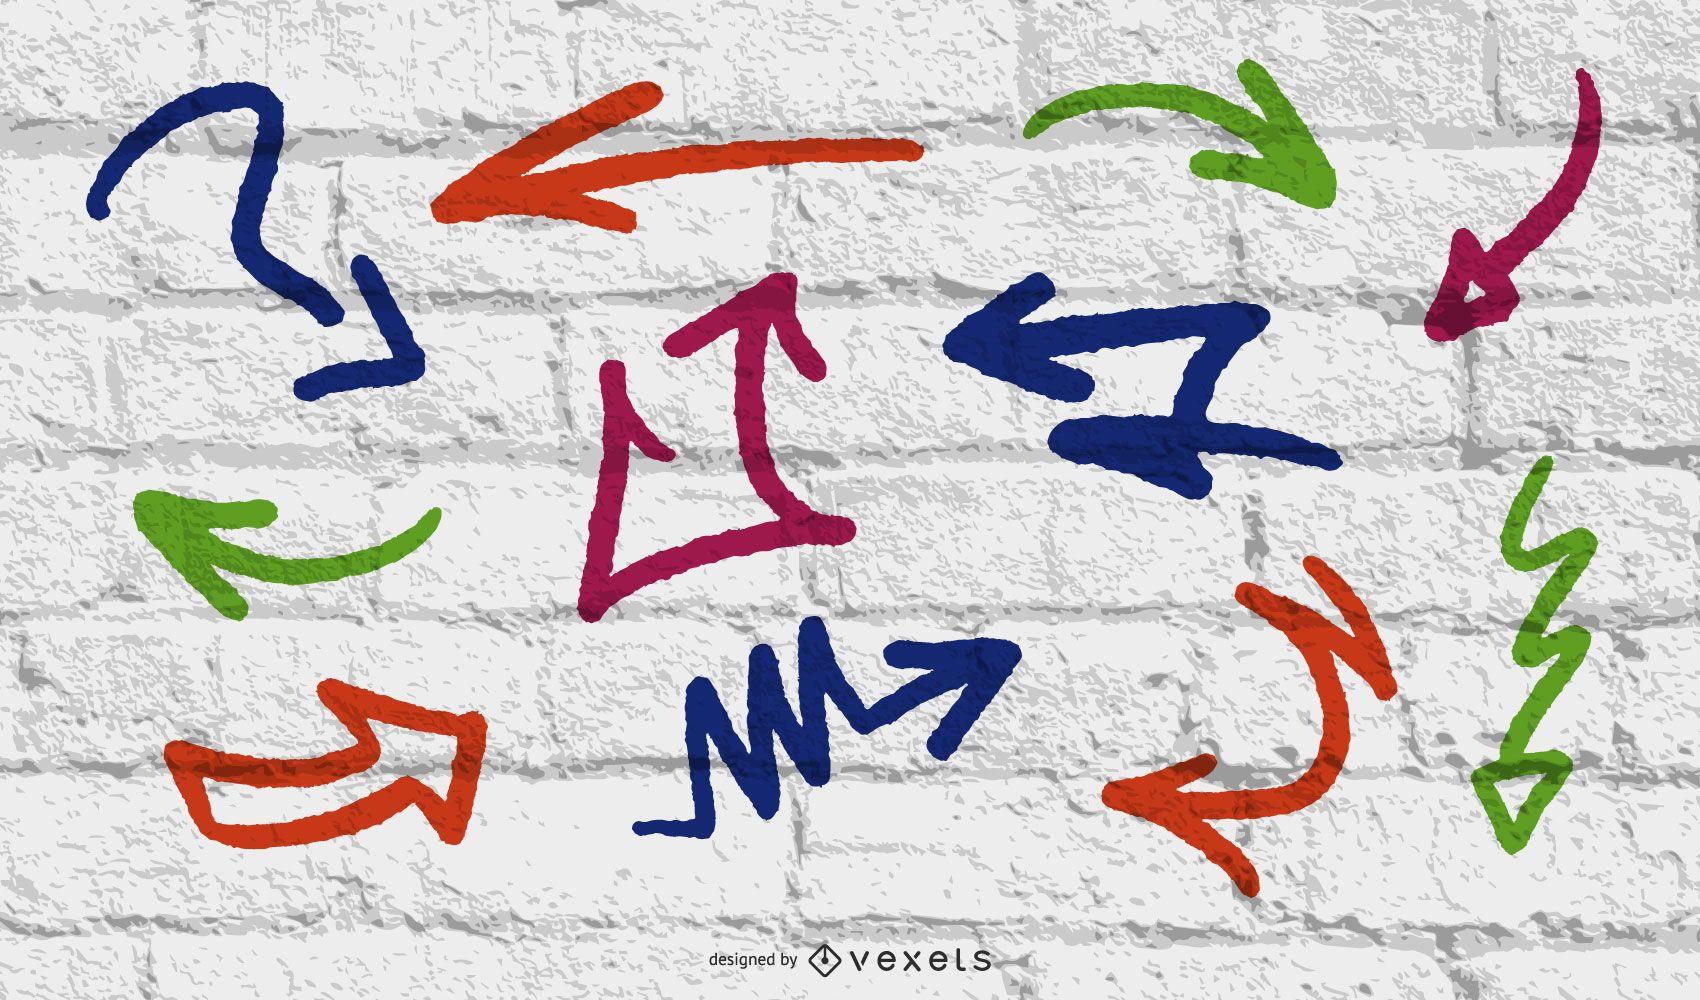 Conjunto de elementos de setas de graffiti